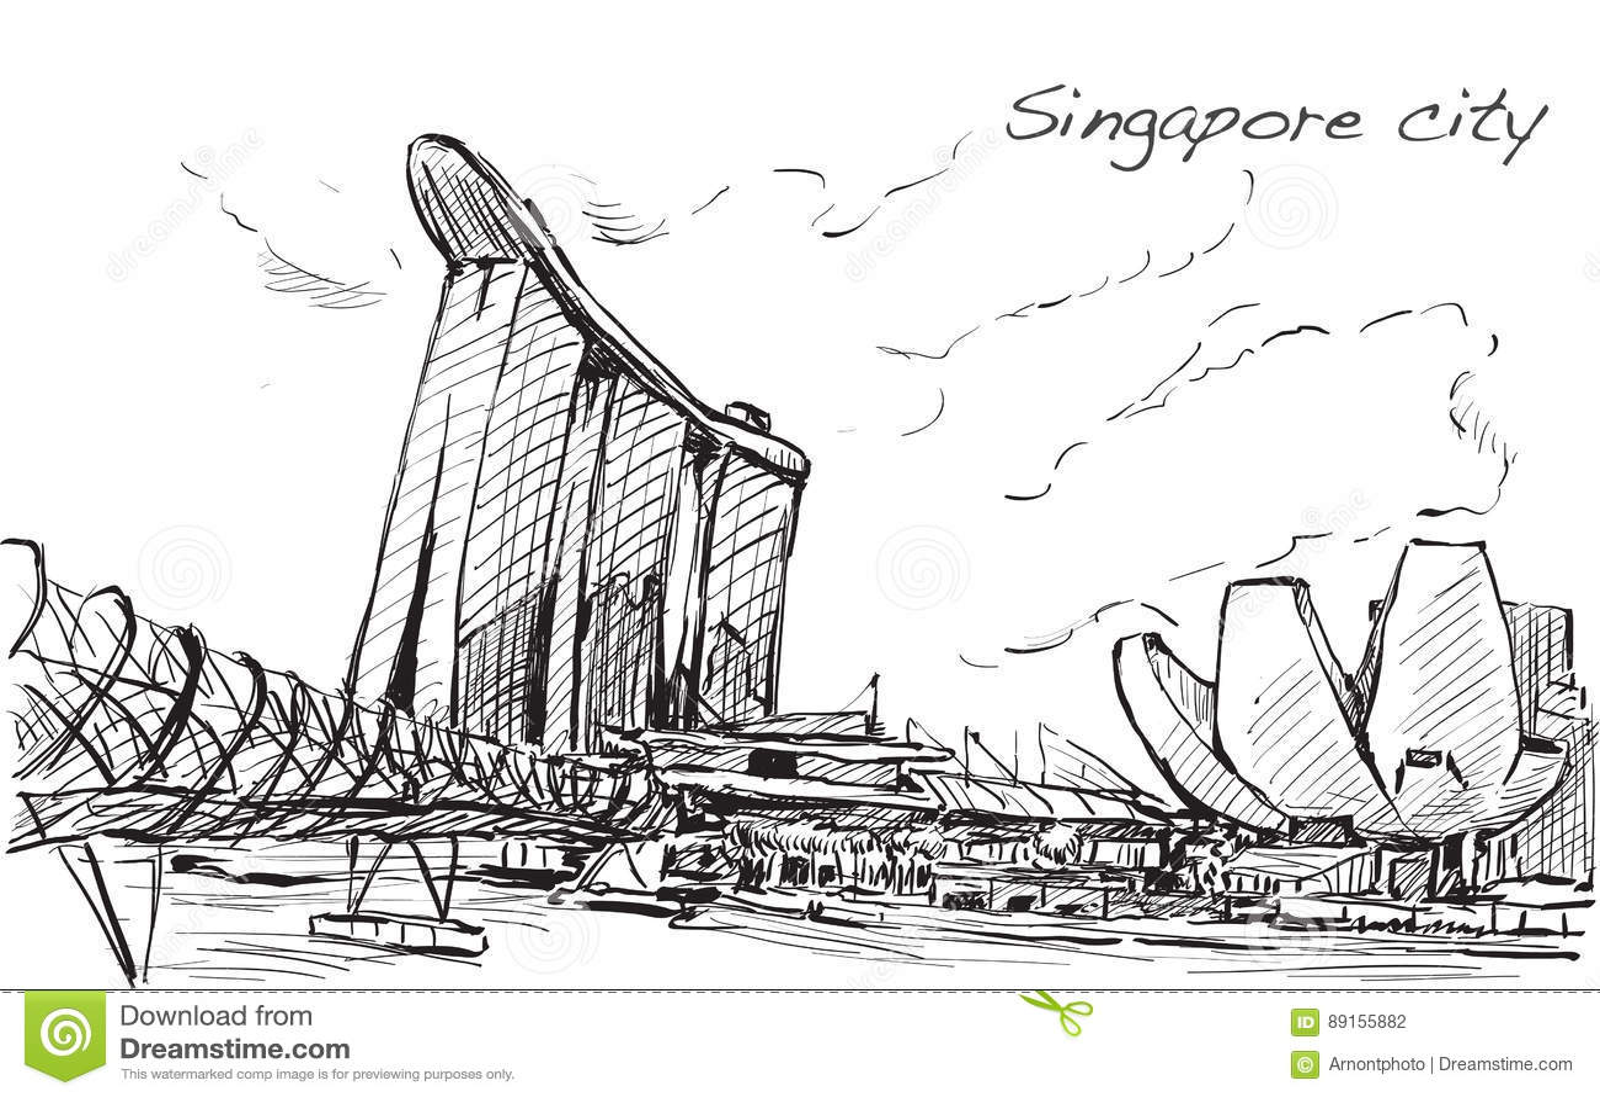 Sketch Cityscape Of Singapore Skyline, Free Hand Draw Stock